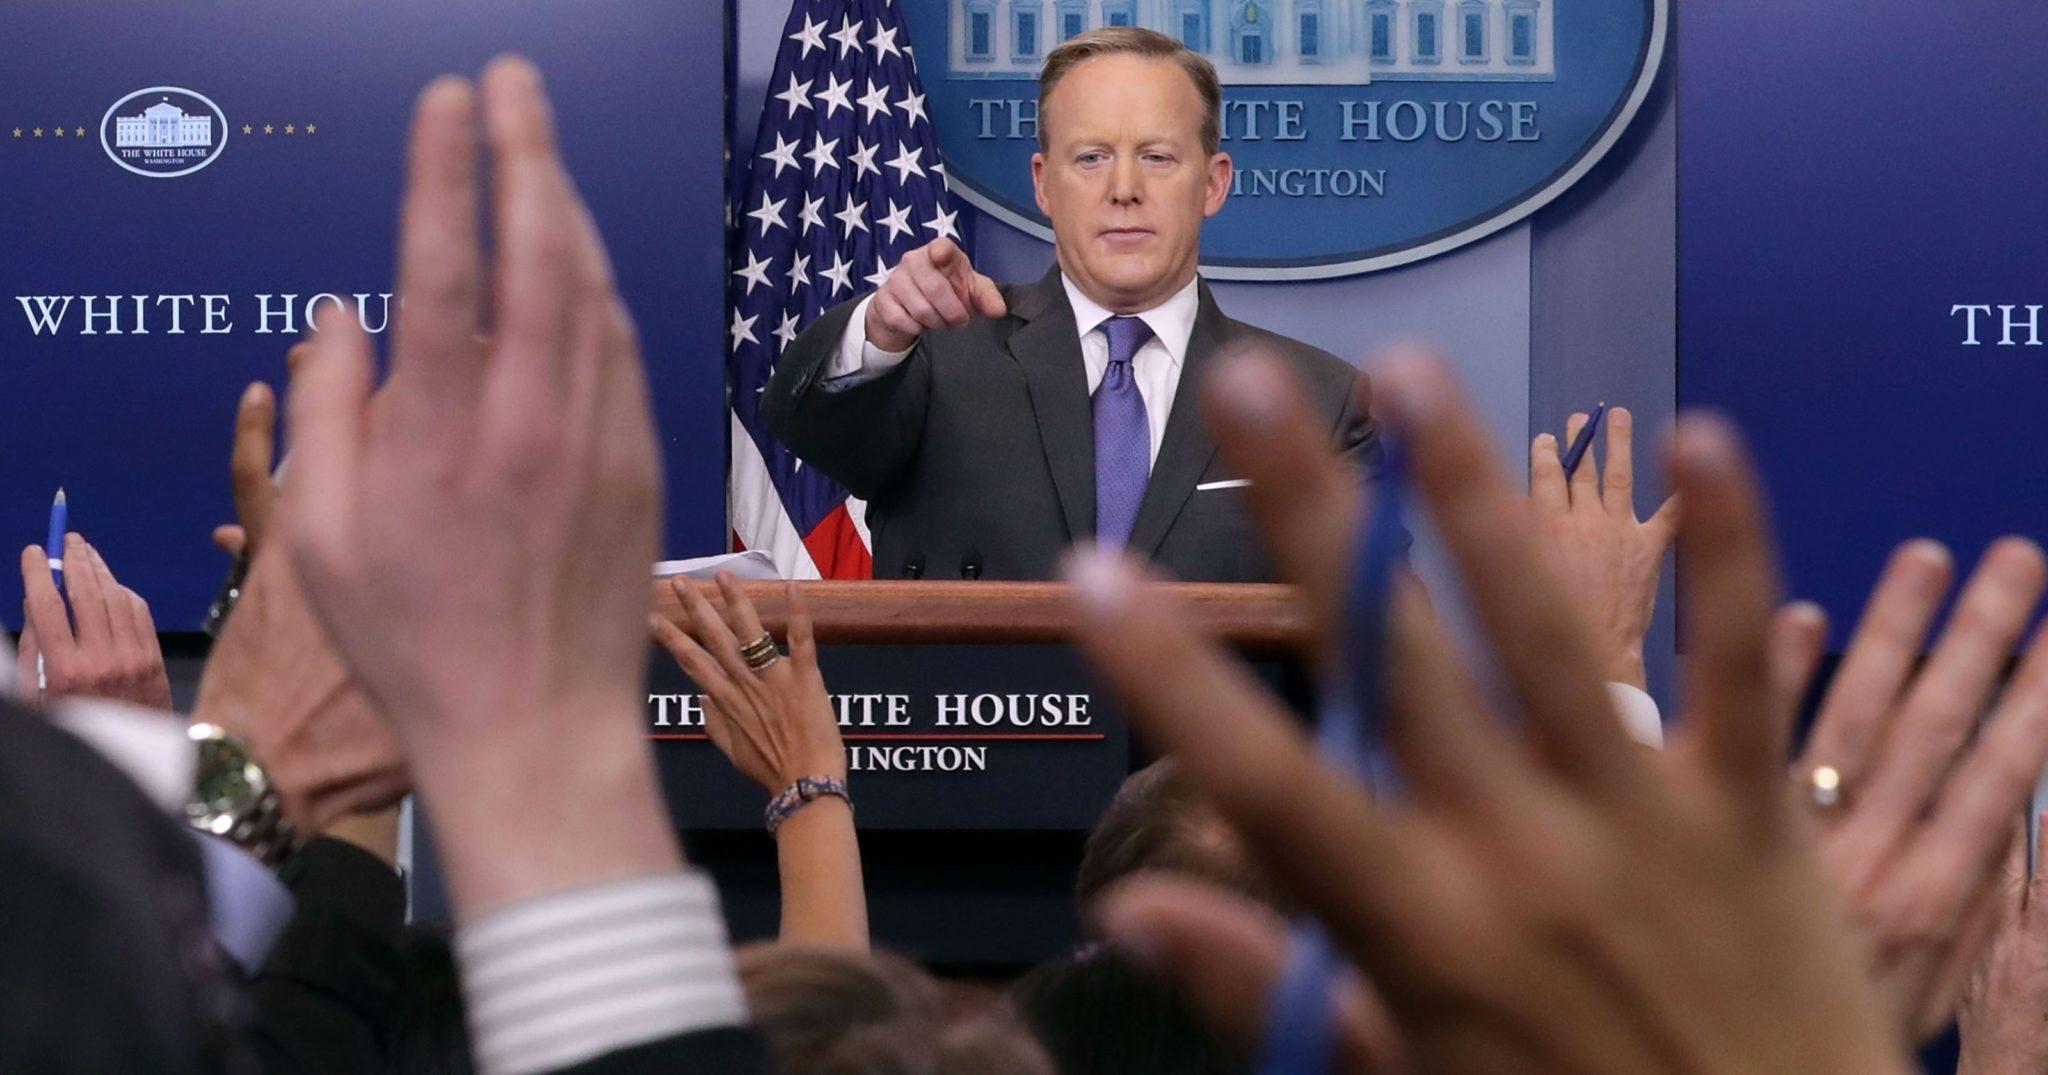 Sean Spicer said he 'screwed up' as press secretary